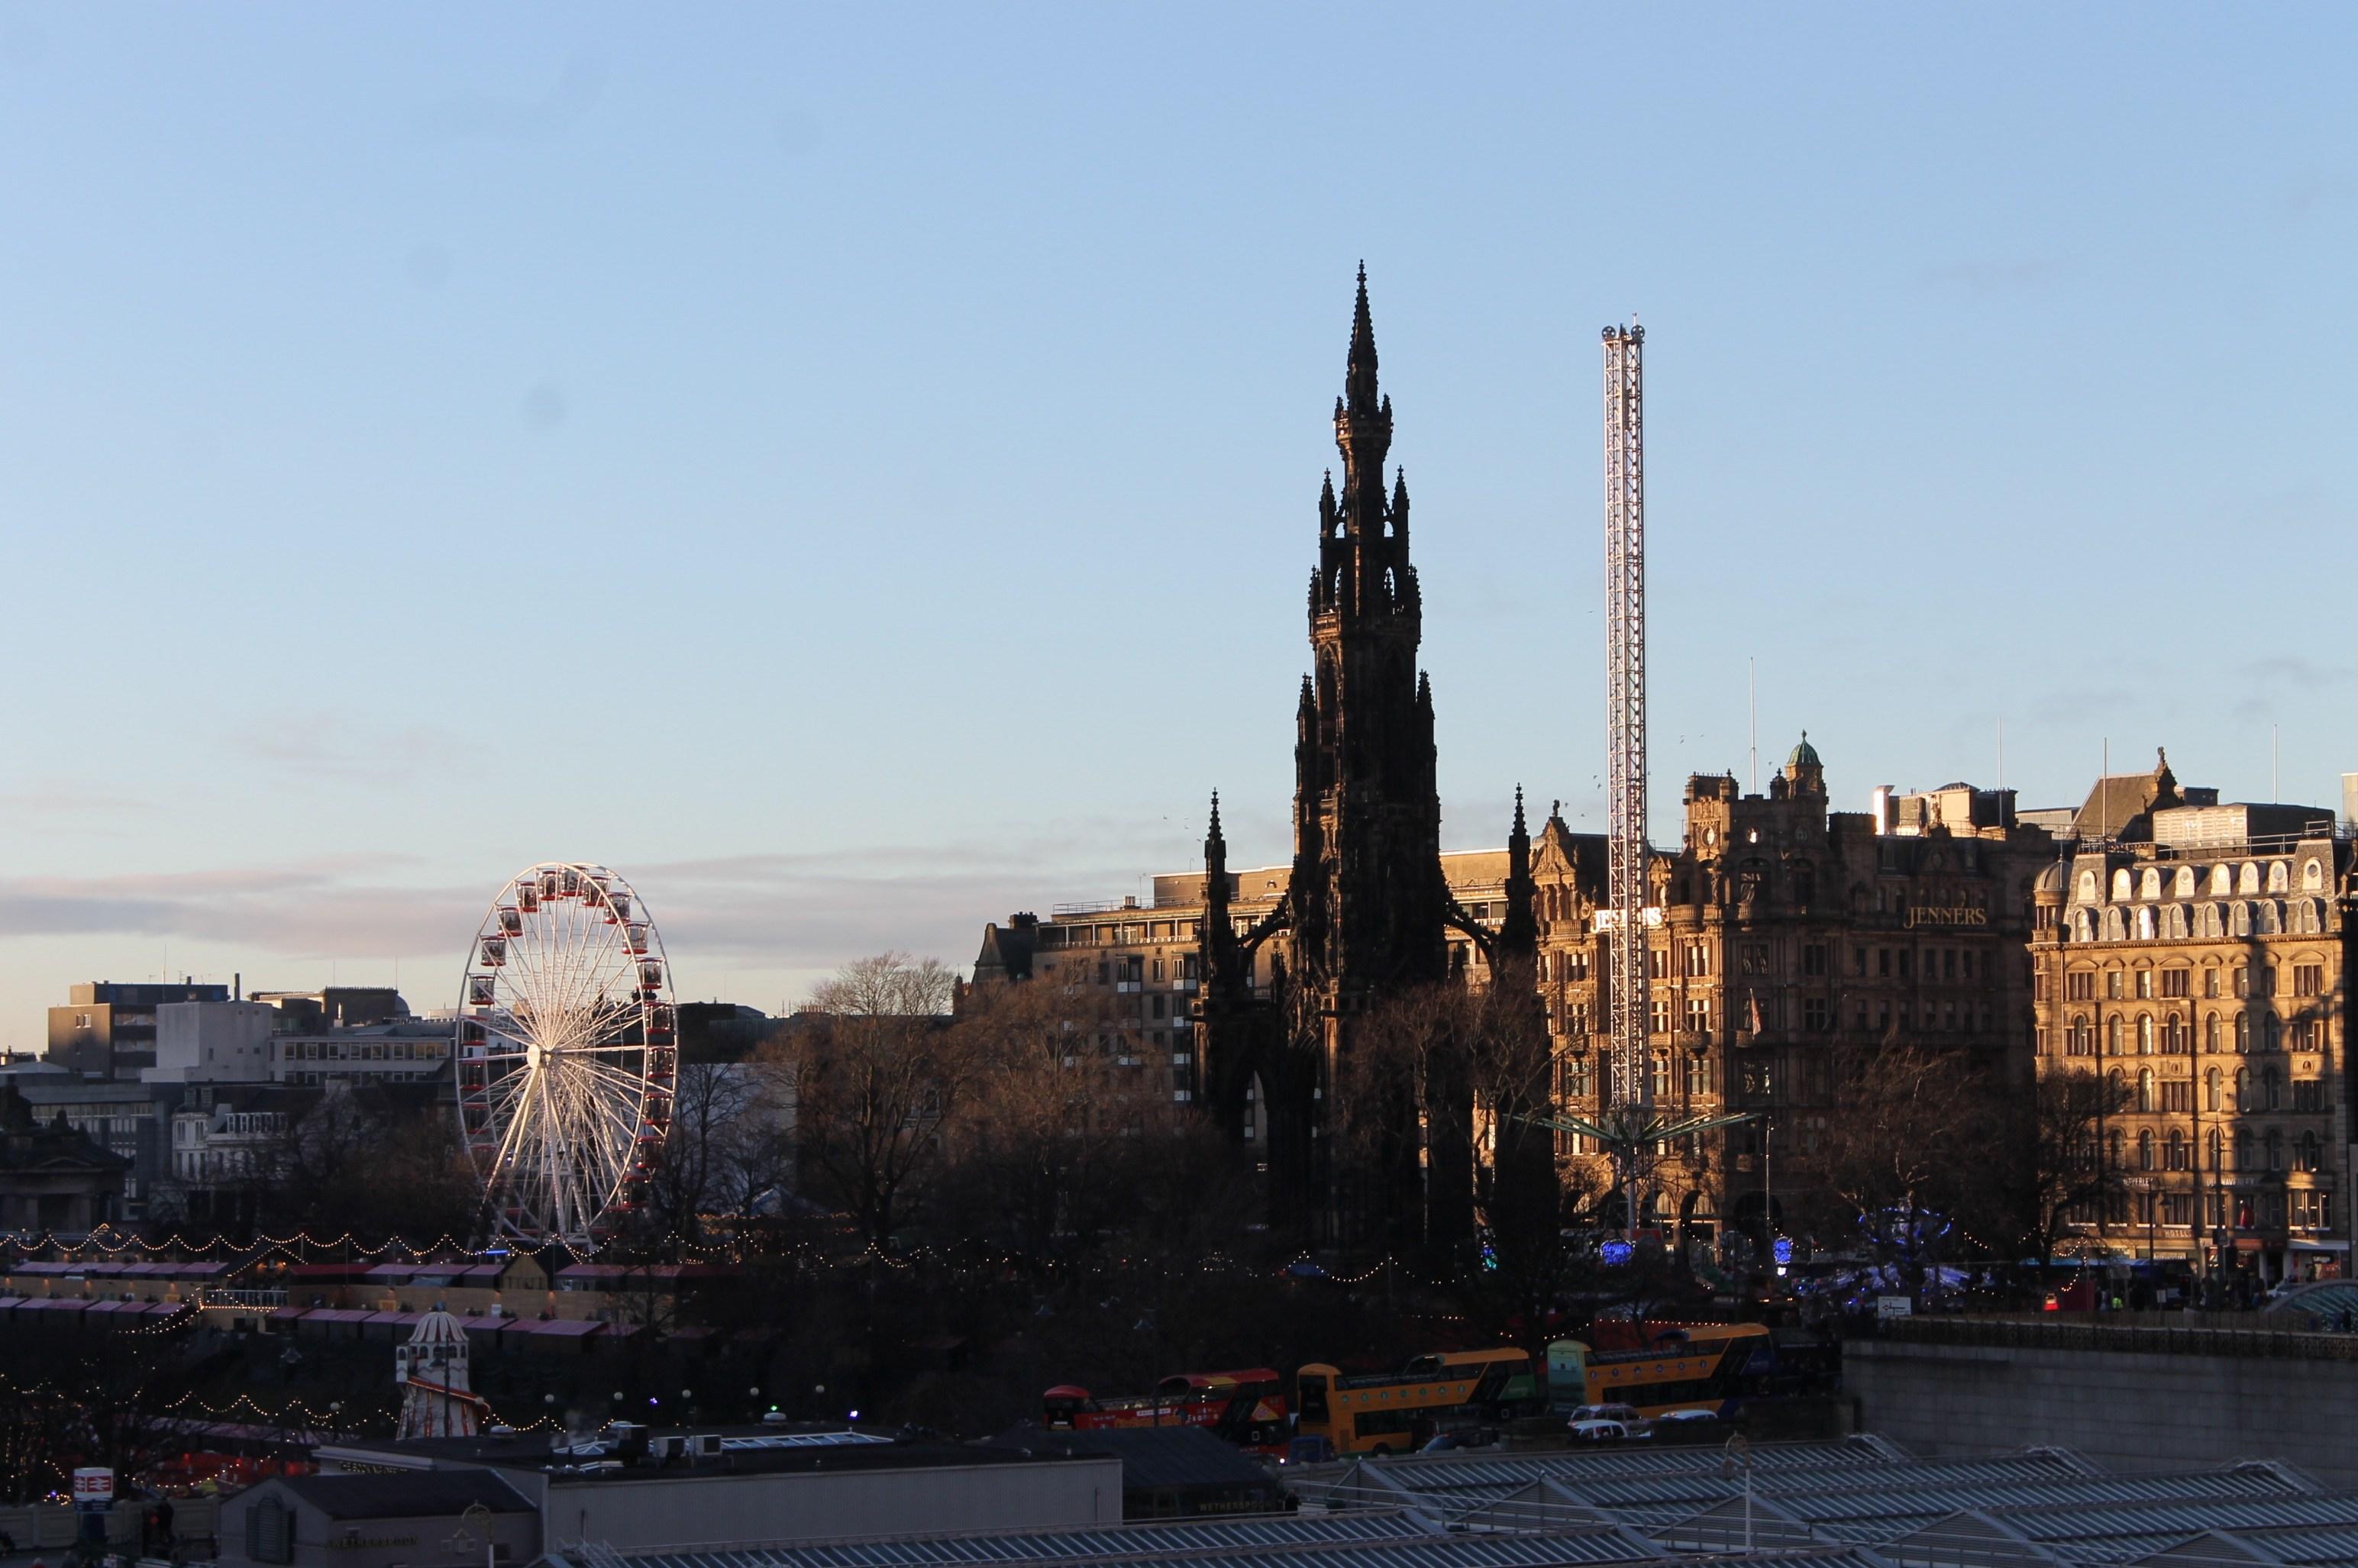 Edinburgh Christmas Market Day View